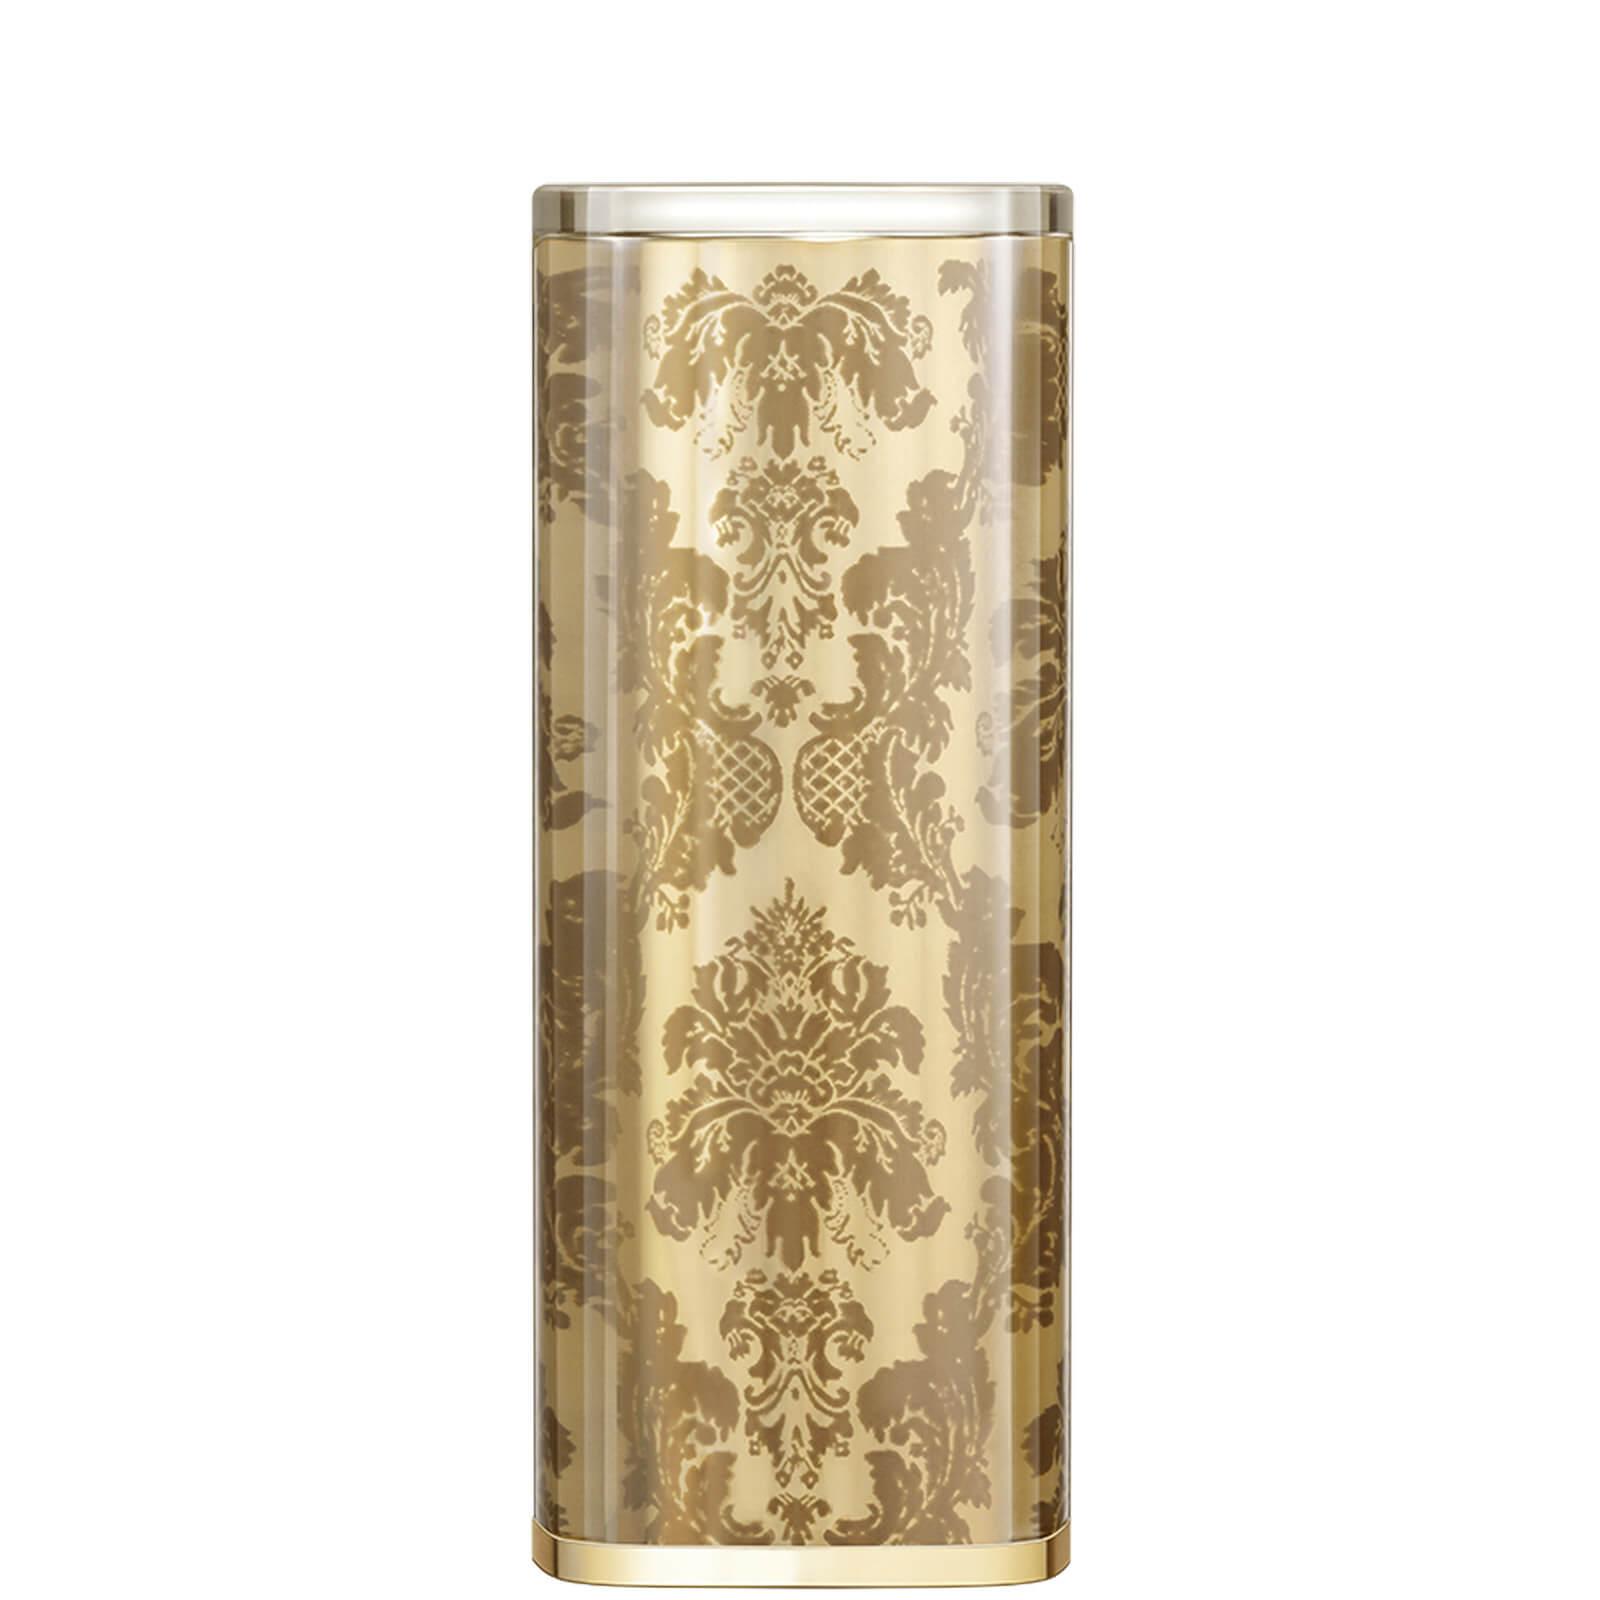 Купить Dolce&Gabbana The Only One Lipstick Cap - Damasco